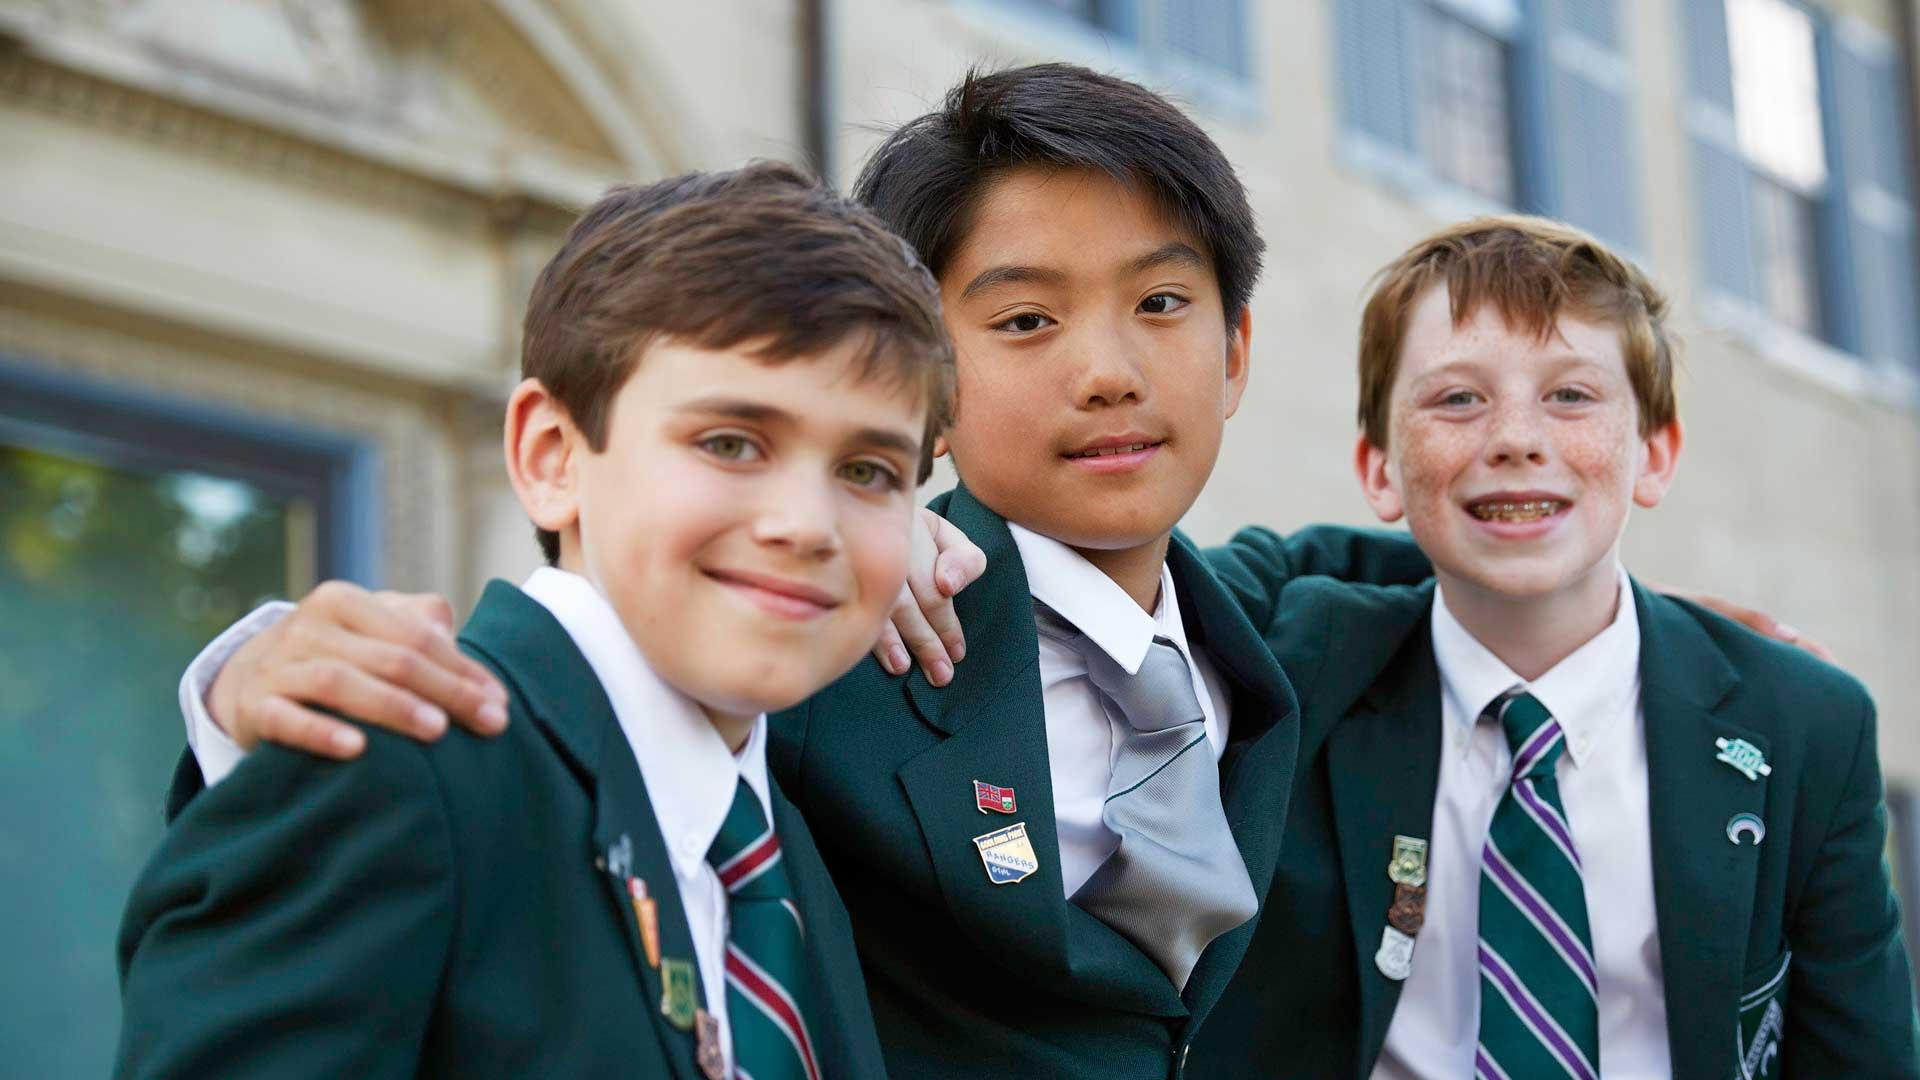 All Boys Private School Ontario